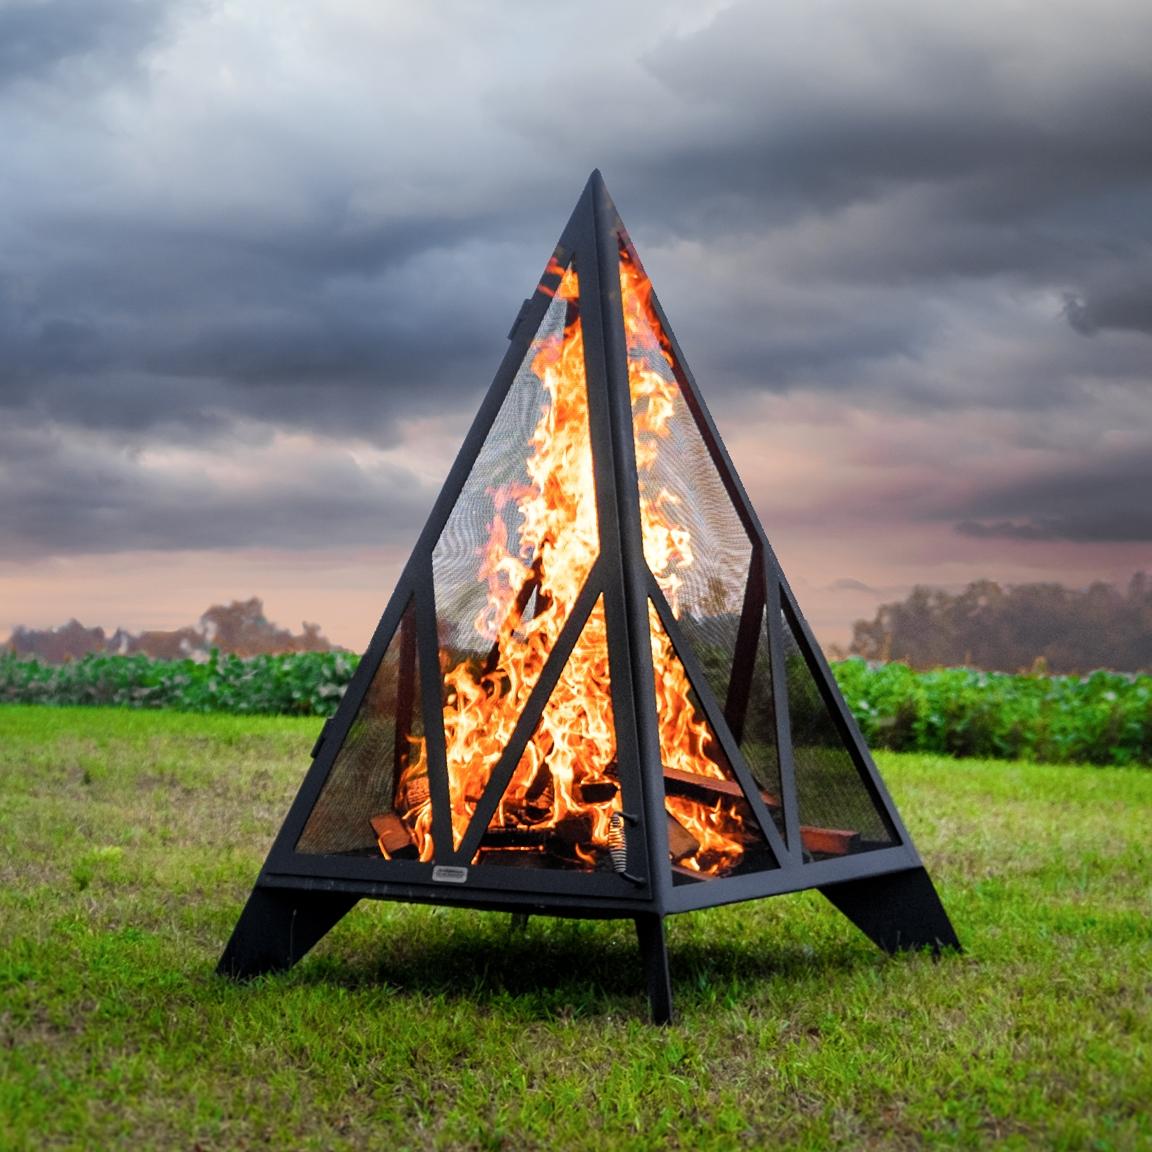 Iron Embers Pyramid Outdoor Fireplace